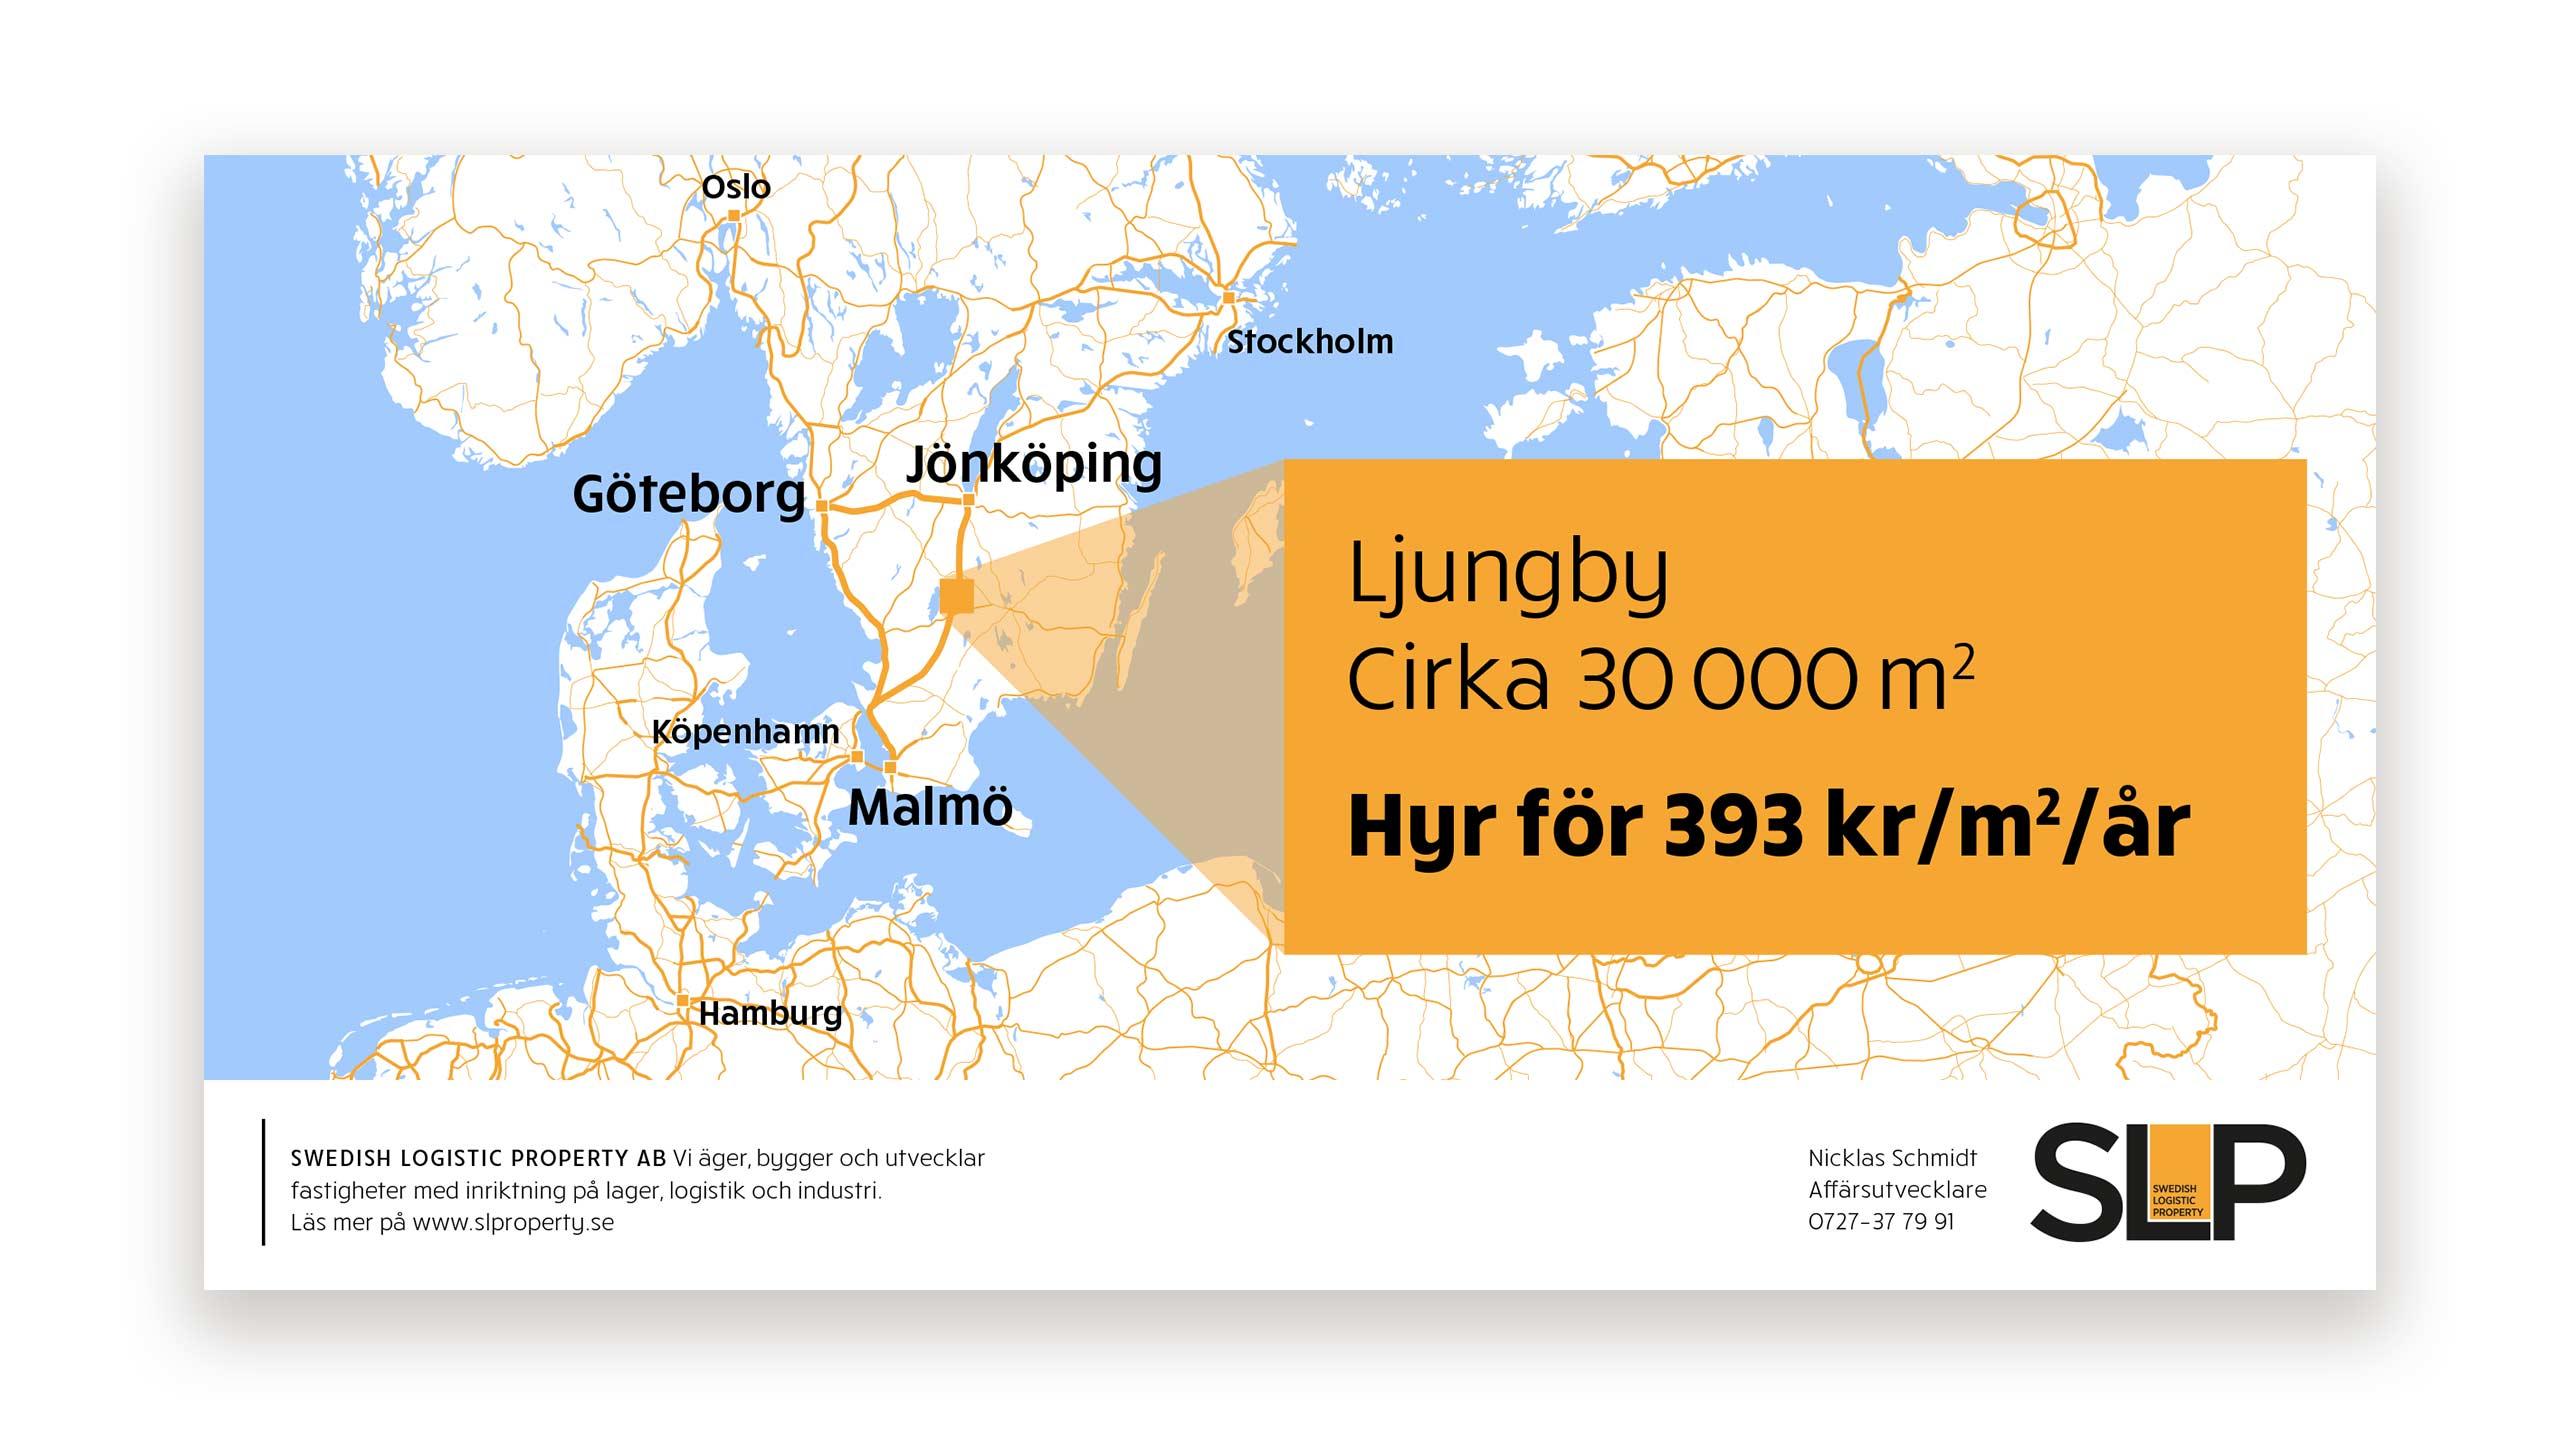 Ad design for Swedish Logistic Property